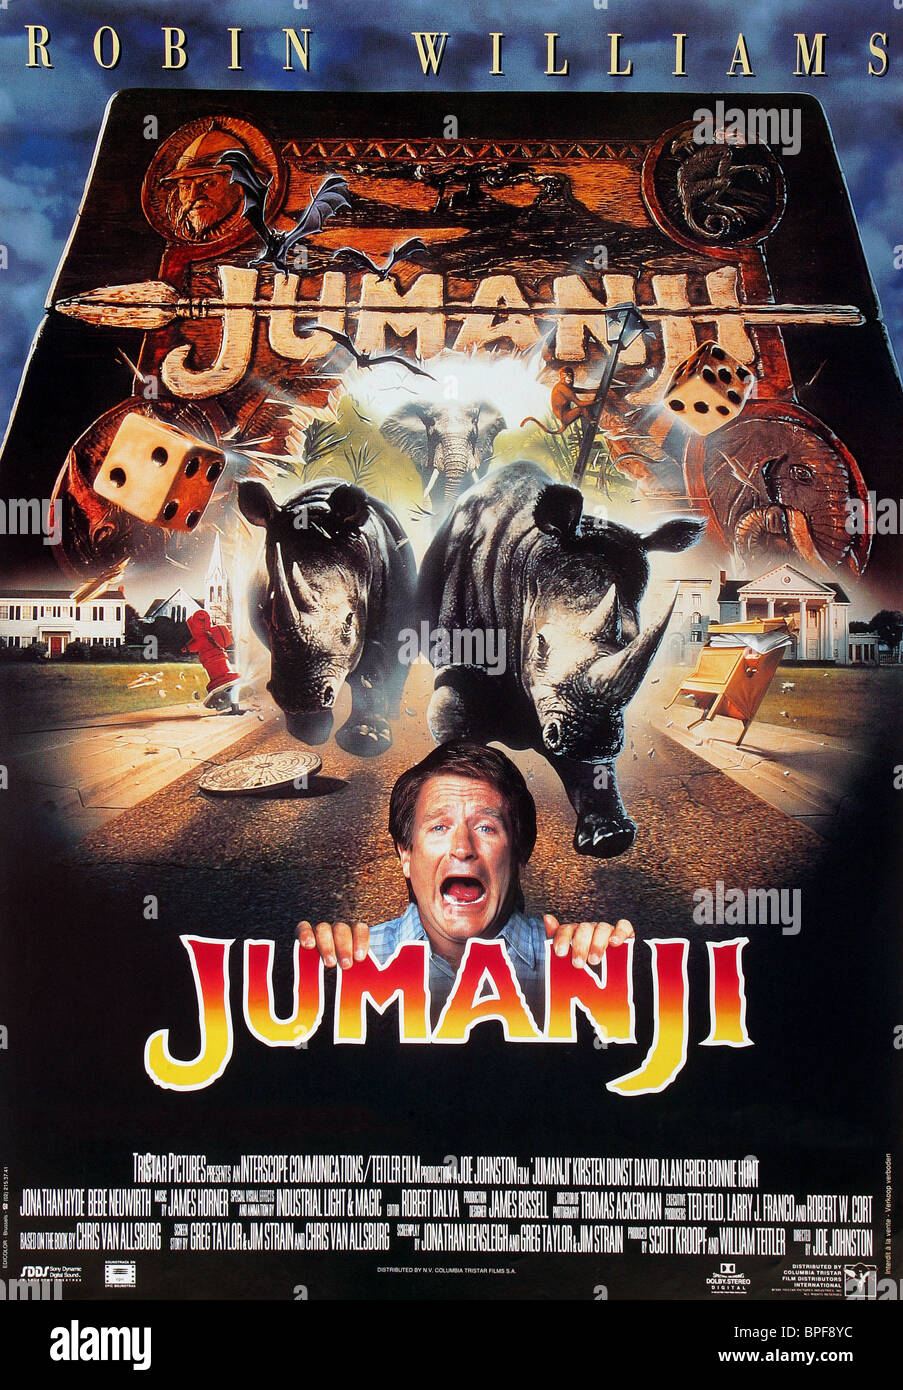 FILM POSTER JUMANJI (1995) - Stock Image